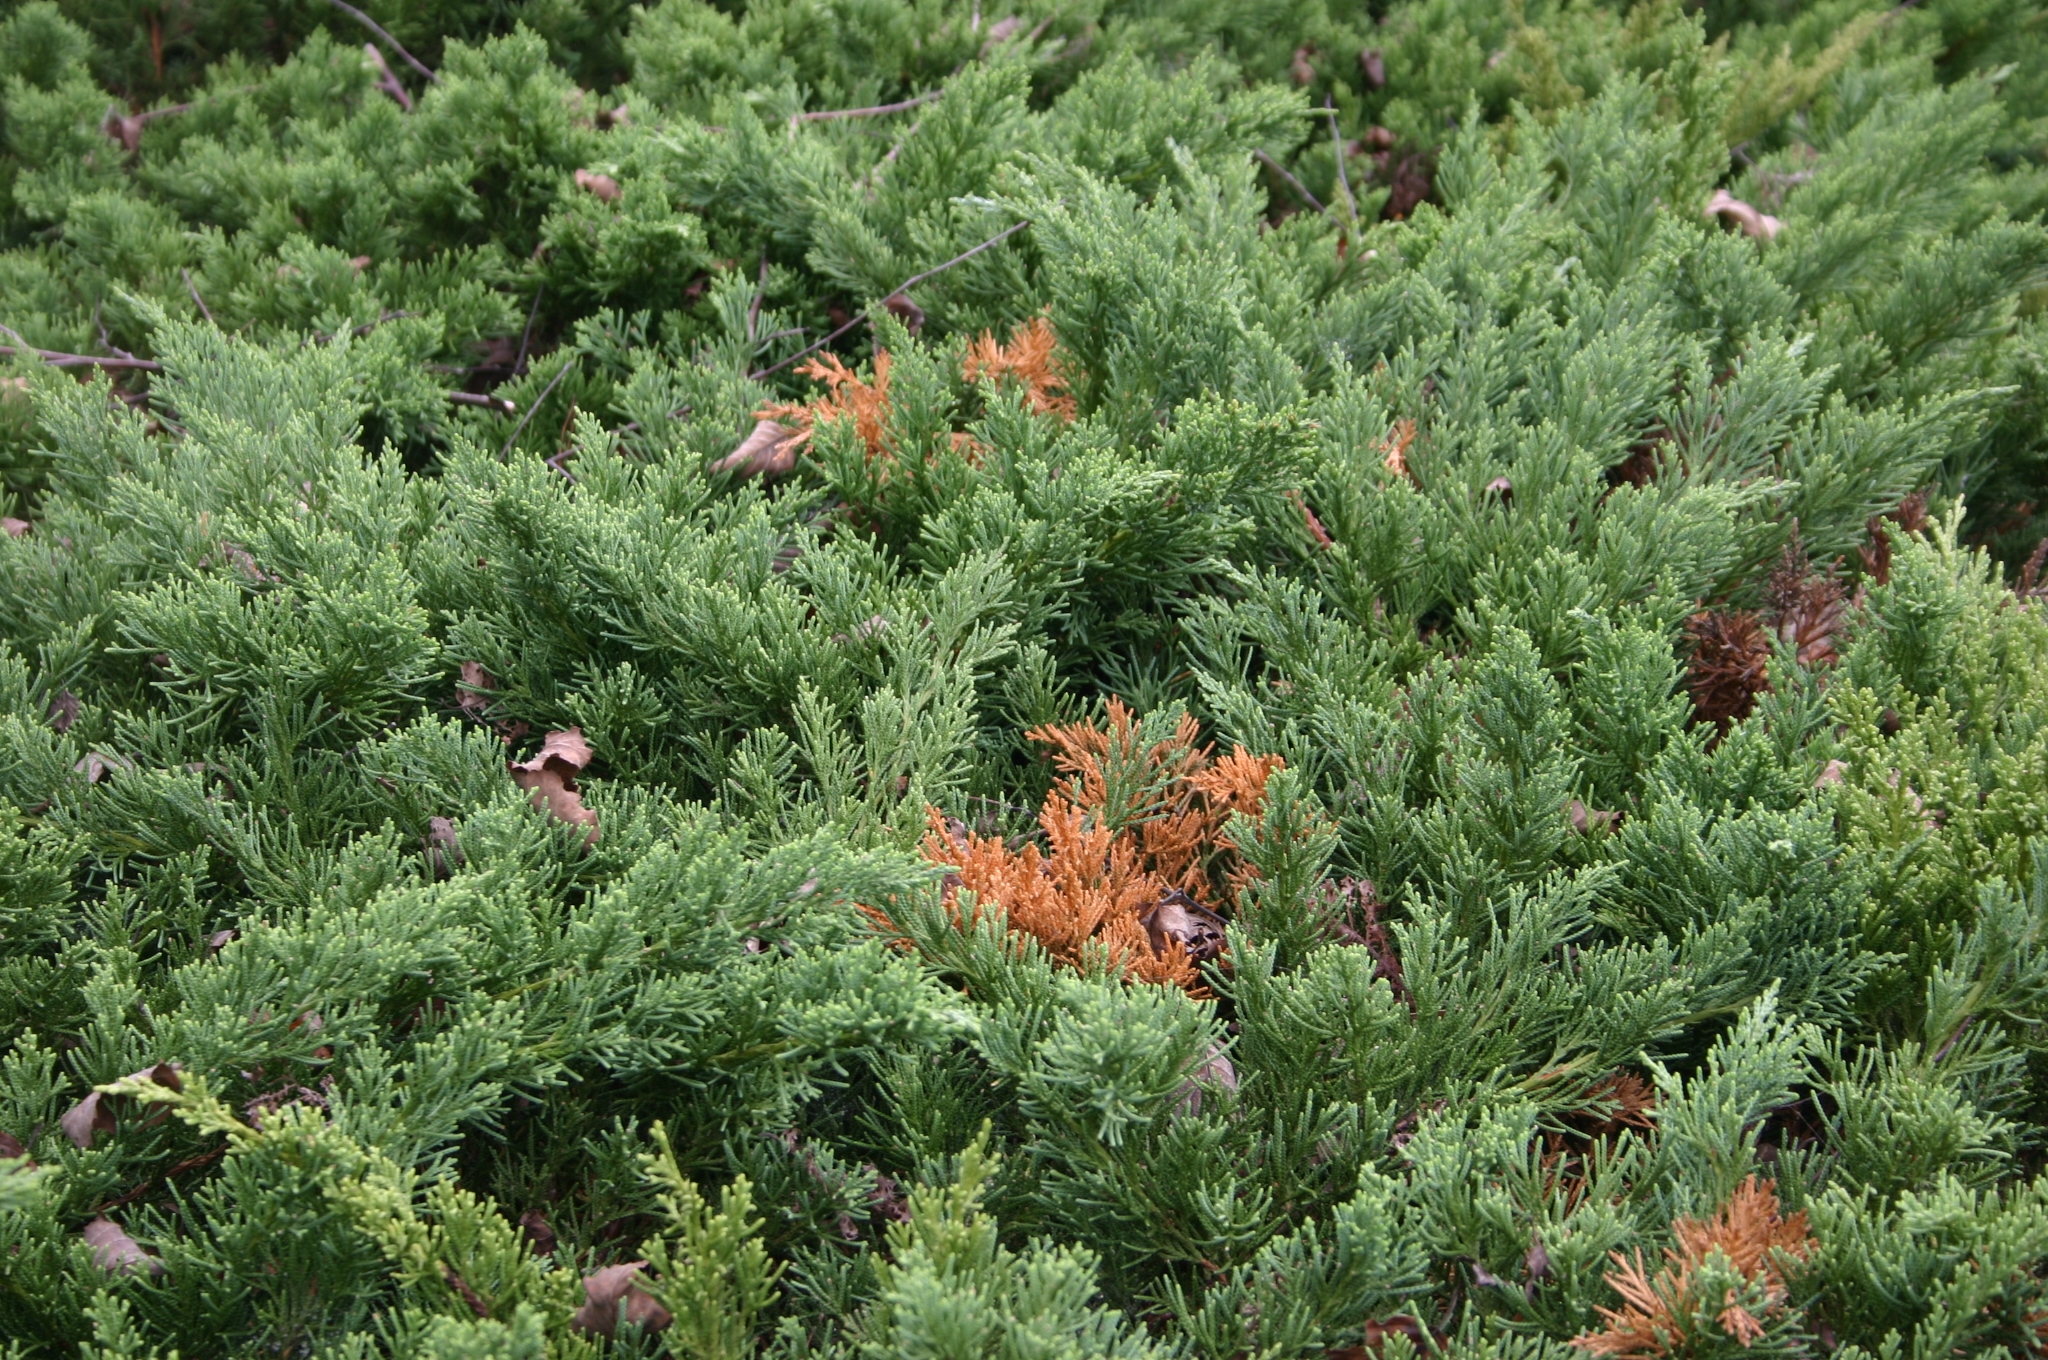 juniper dead branches